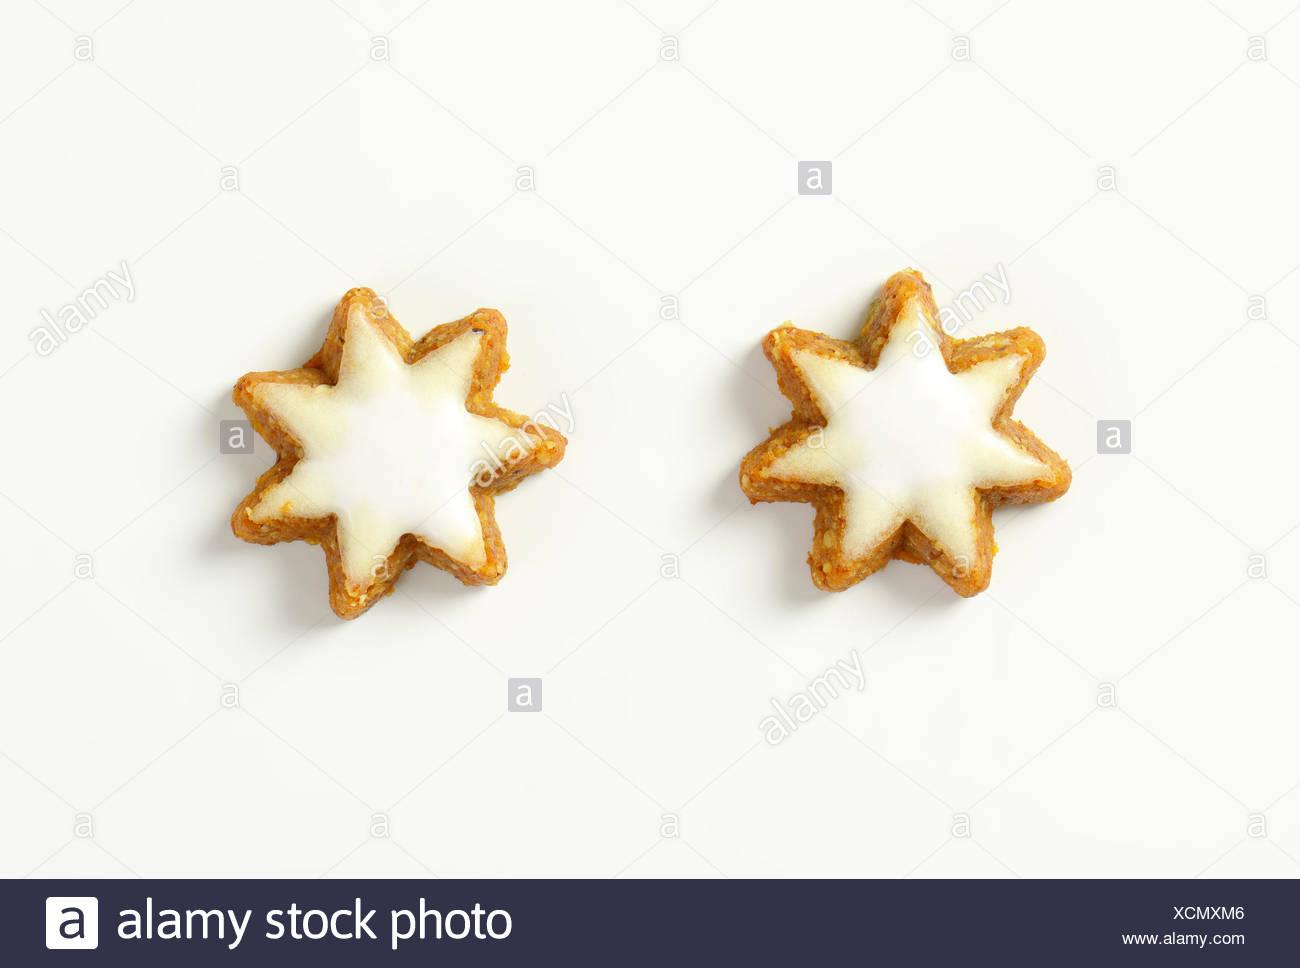 Zimtsterne Cinnamon Stars Traditional German Christmas Cookies